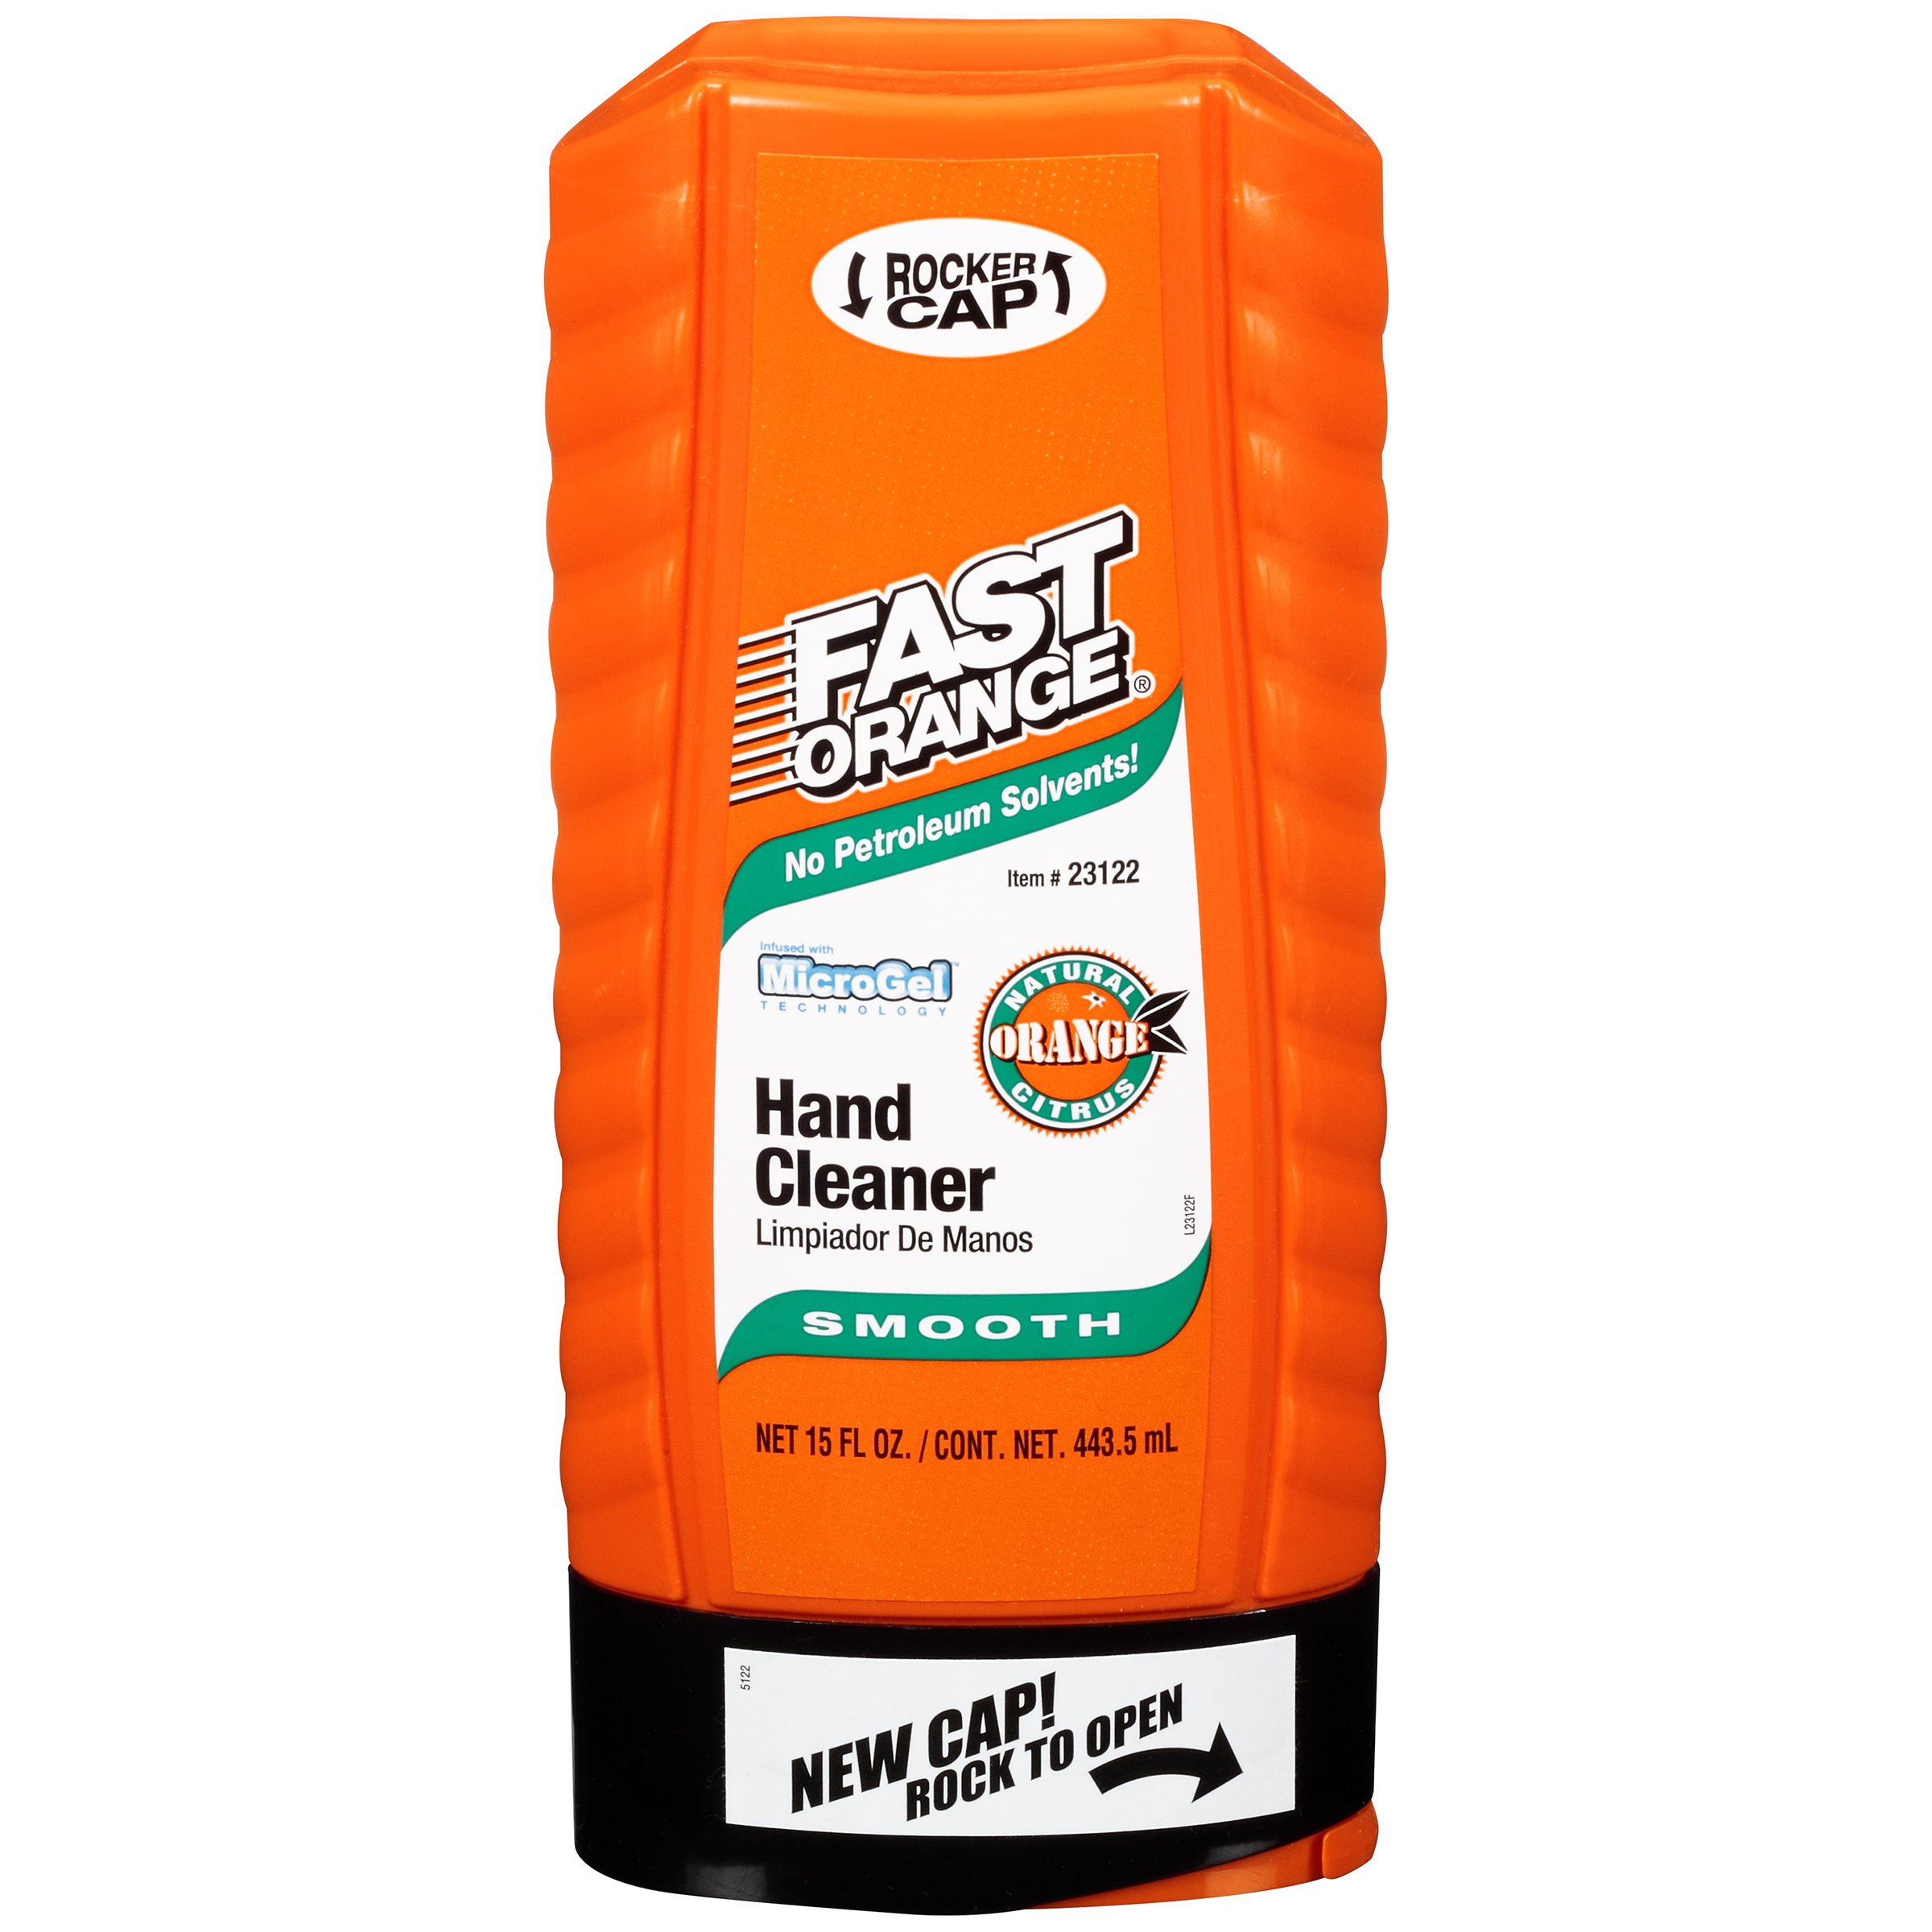 Permatex 23122-12PK Fast Orange Smooth Lotion Hand Cleaner - 15 fl. oz., (Pack of 12) by Permatex (Image #2)